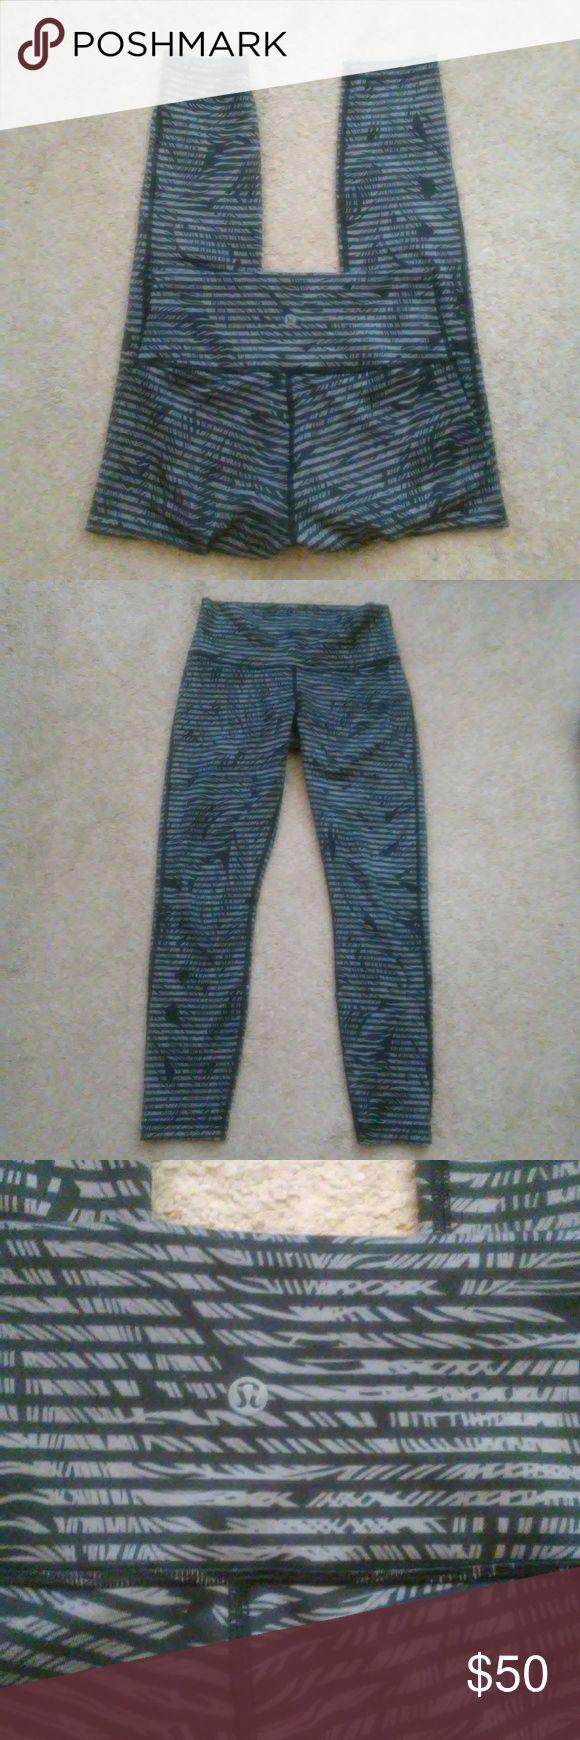 Lululemon Leggings High waist. No pockets. Black/gray design. Nylon/spandex. Size tag removed.  Excellent condition. lululemon athletica Pants Leggings